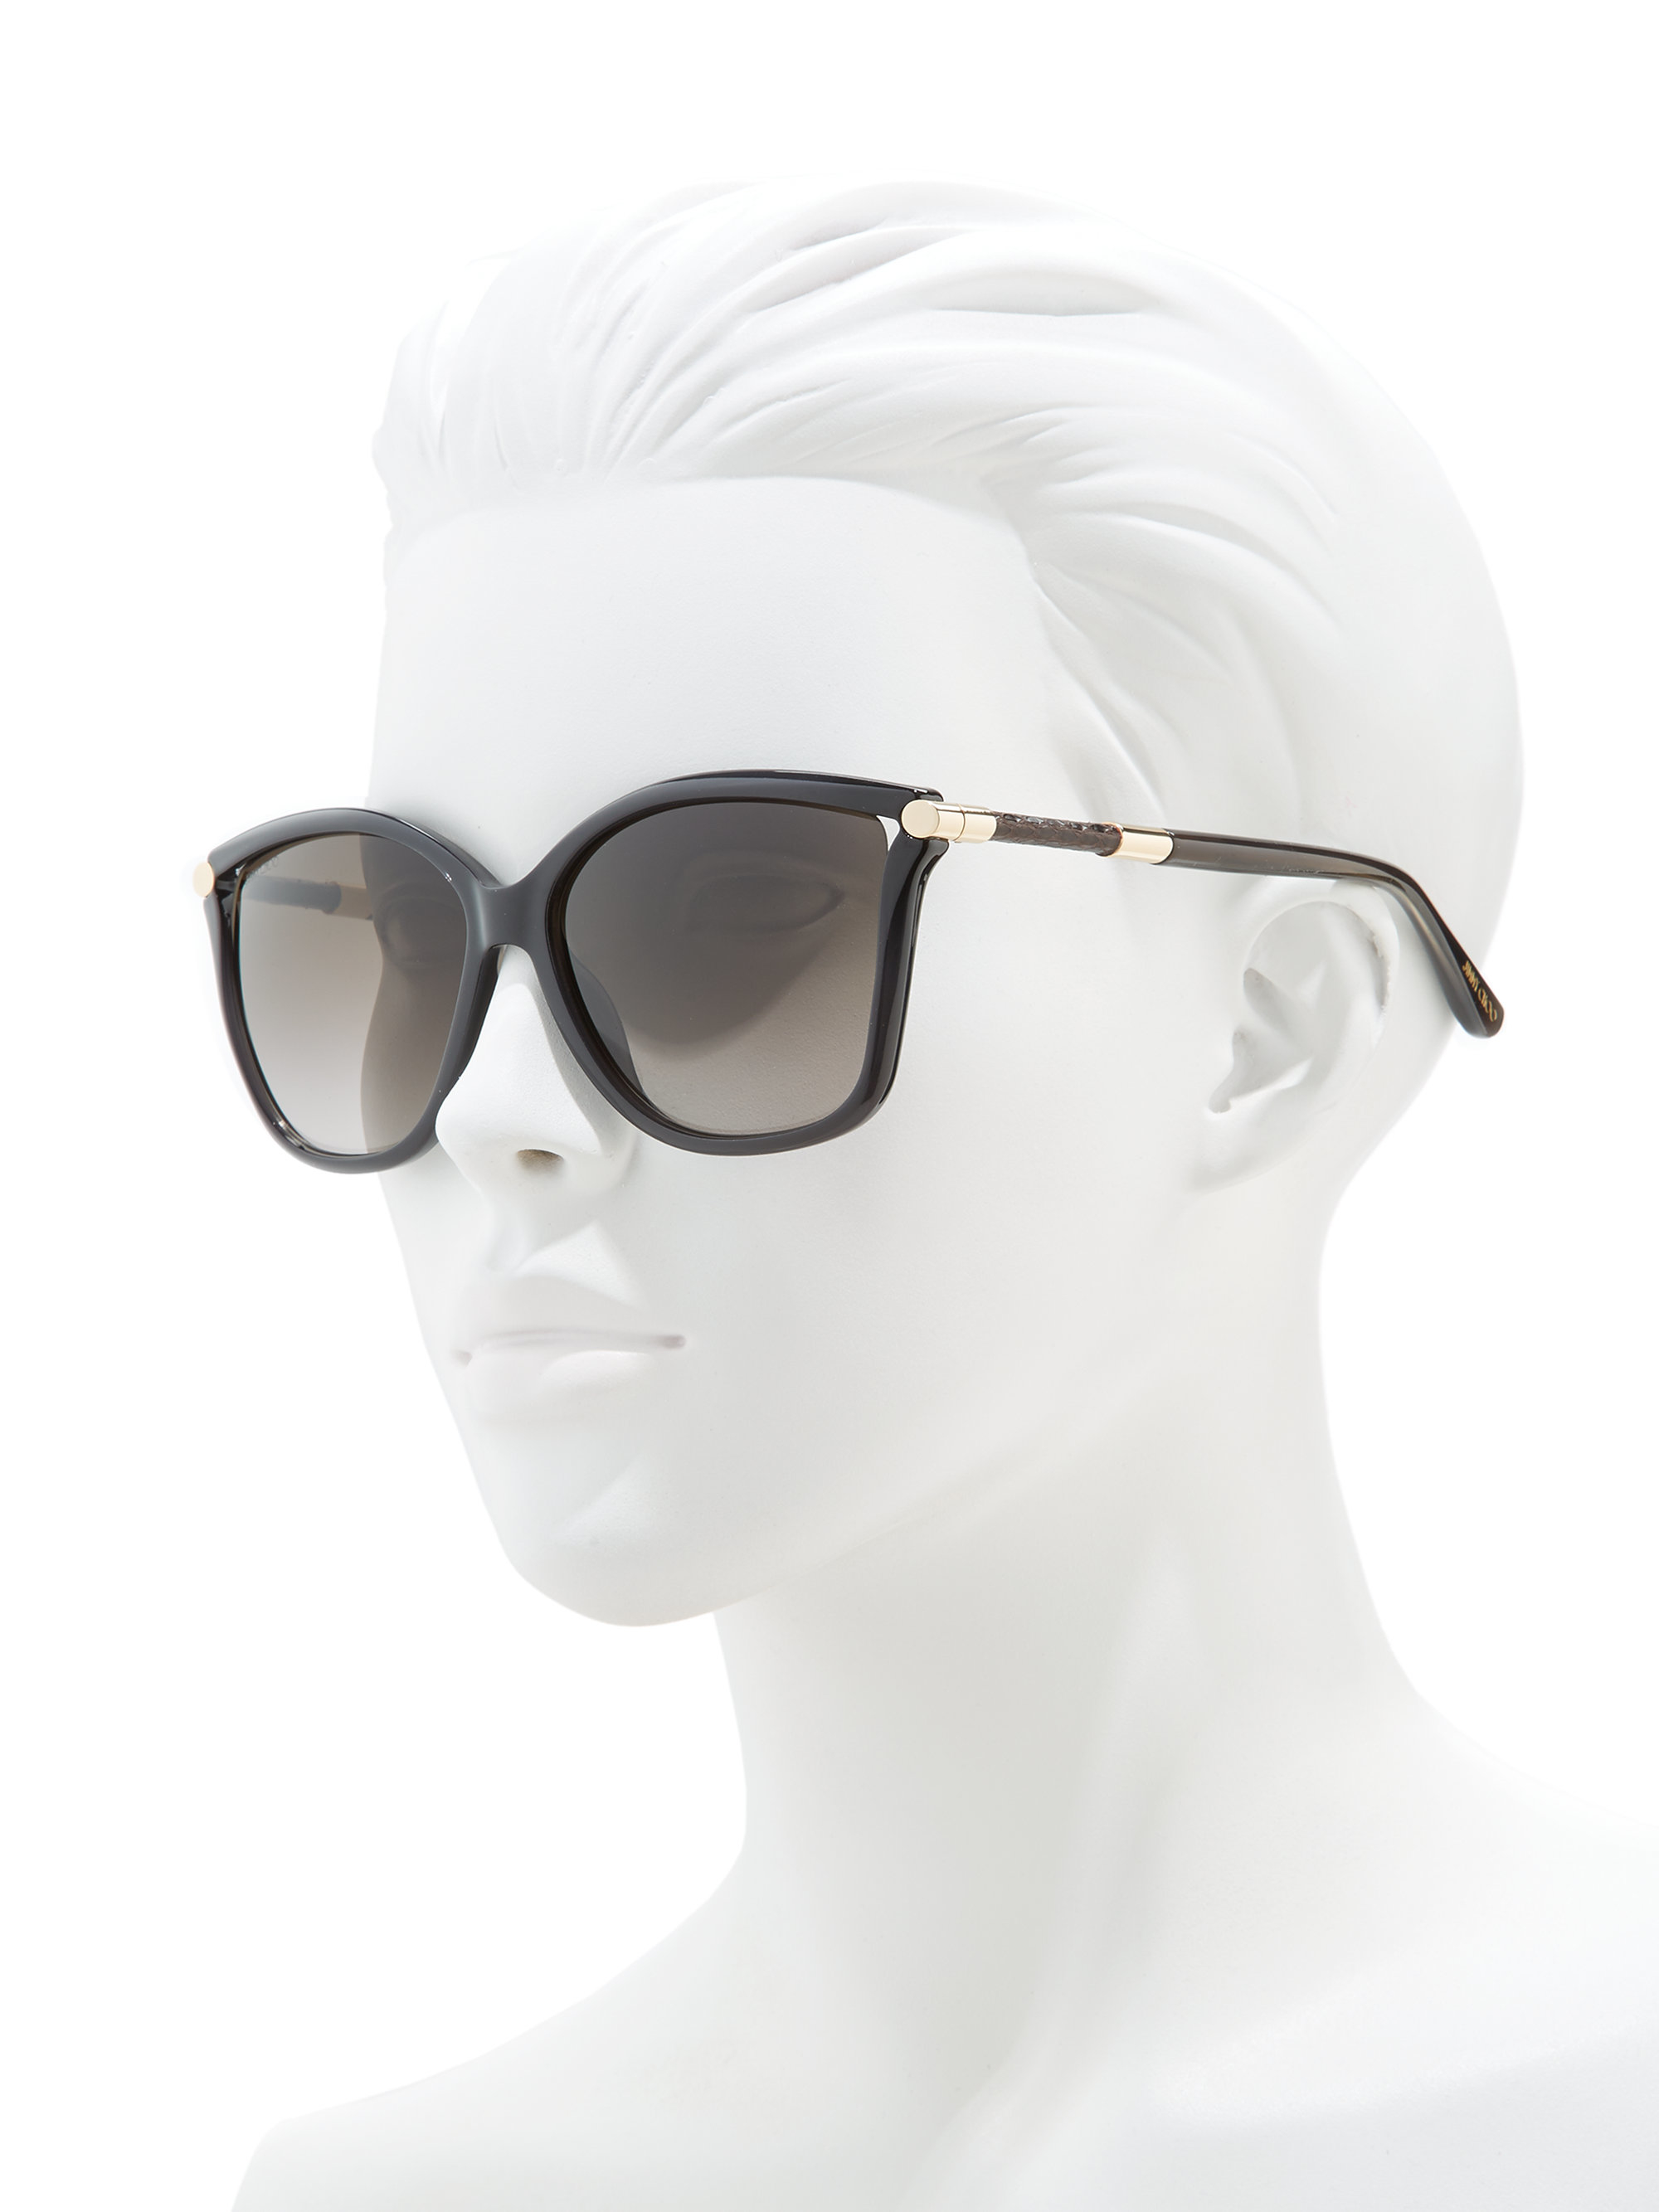 1322cb8b57e Lyst - Jimmy Choo Tatti 58mm Oversized Square Sunglasses in Black